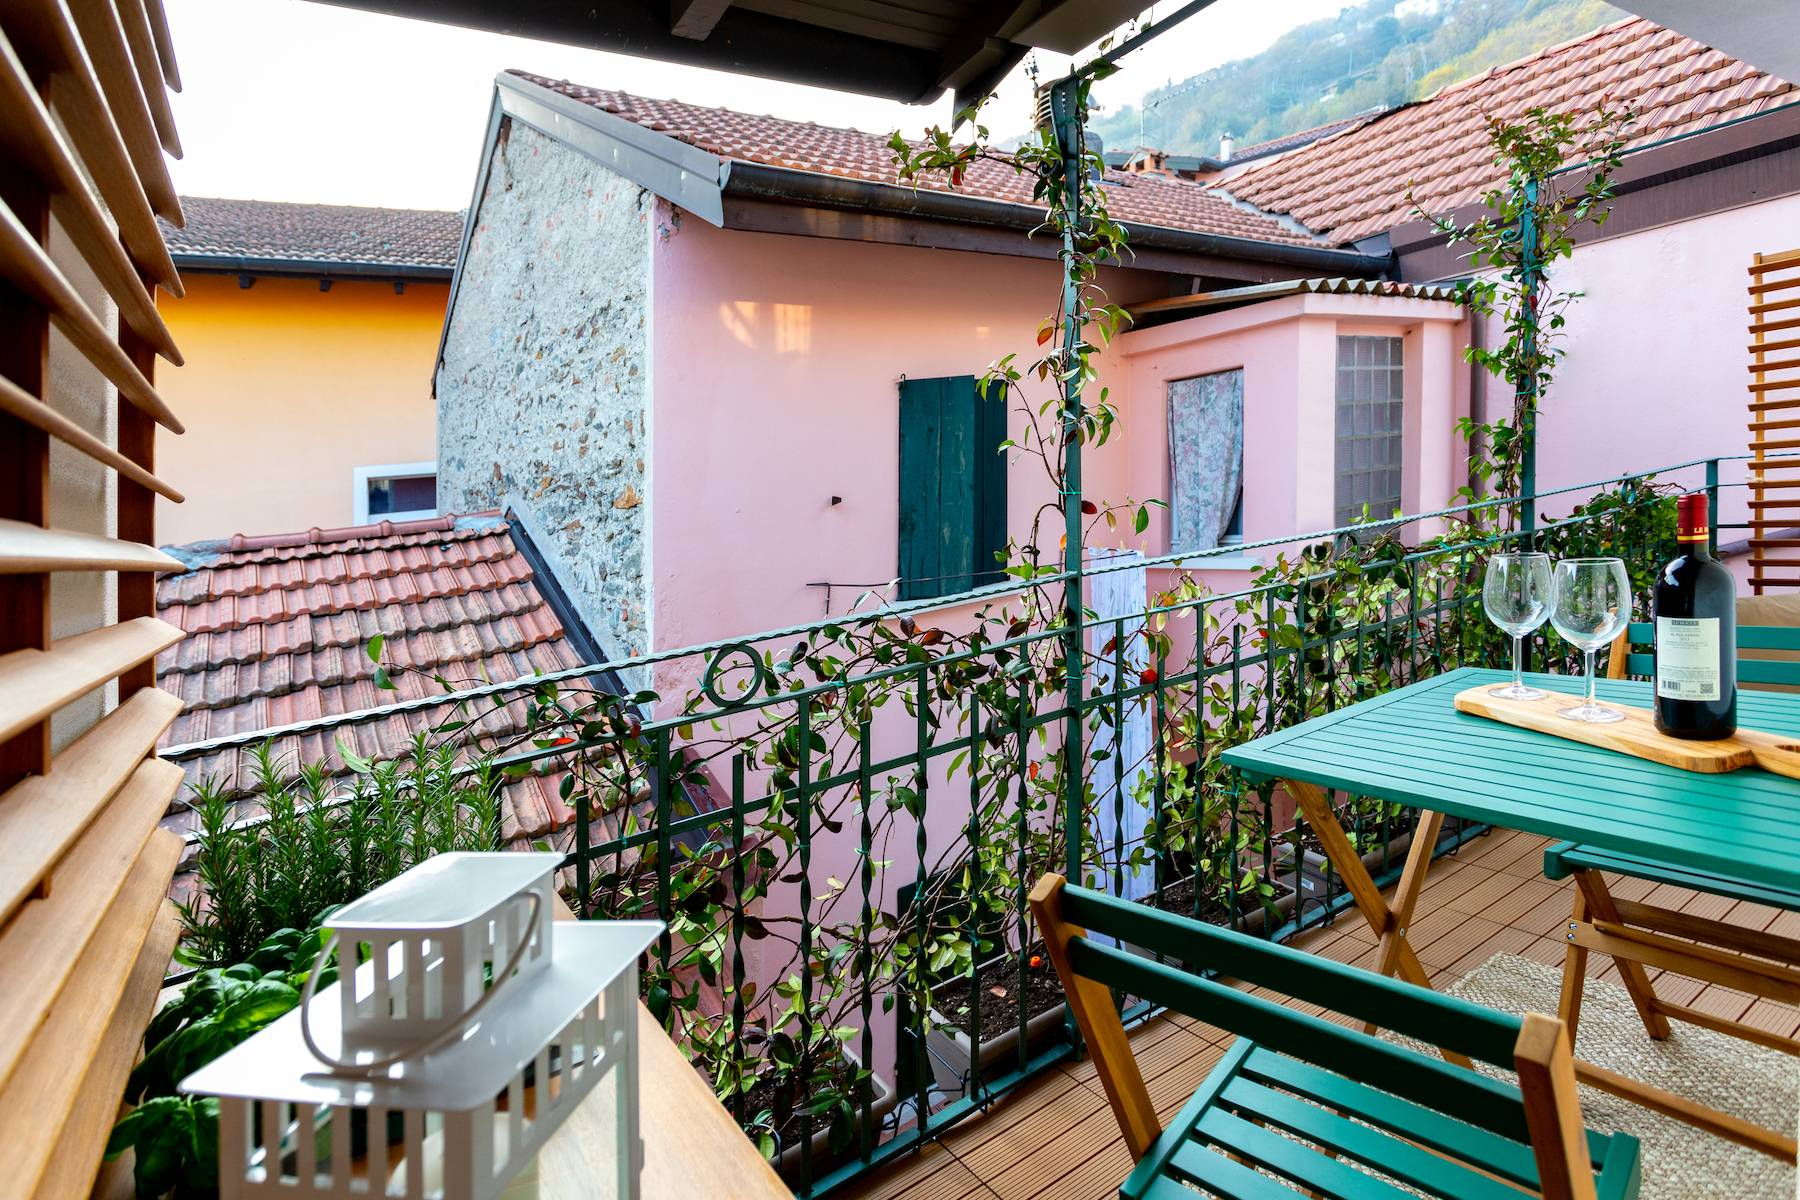 Appartamento in Vendita a Belgirate: 3 locali, 62 mq - Foto 3